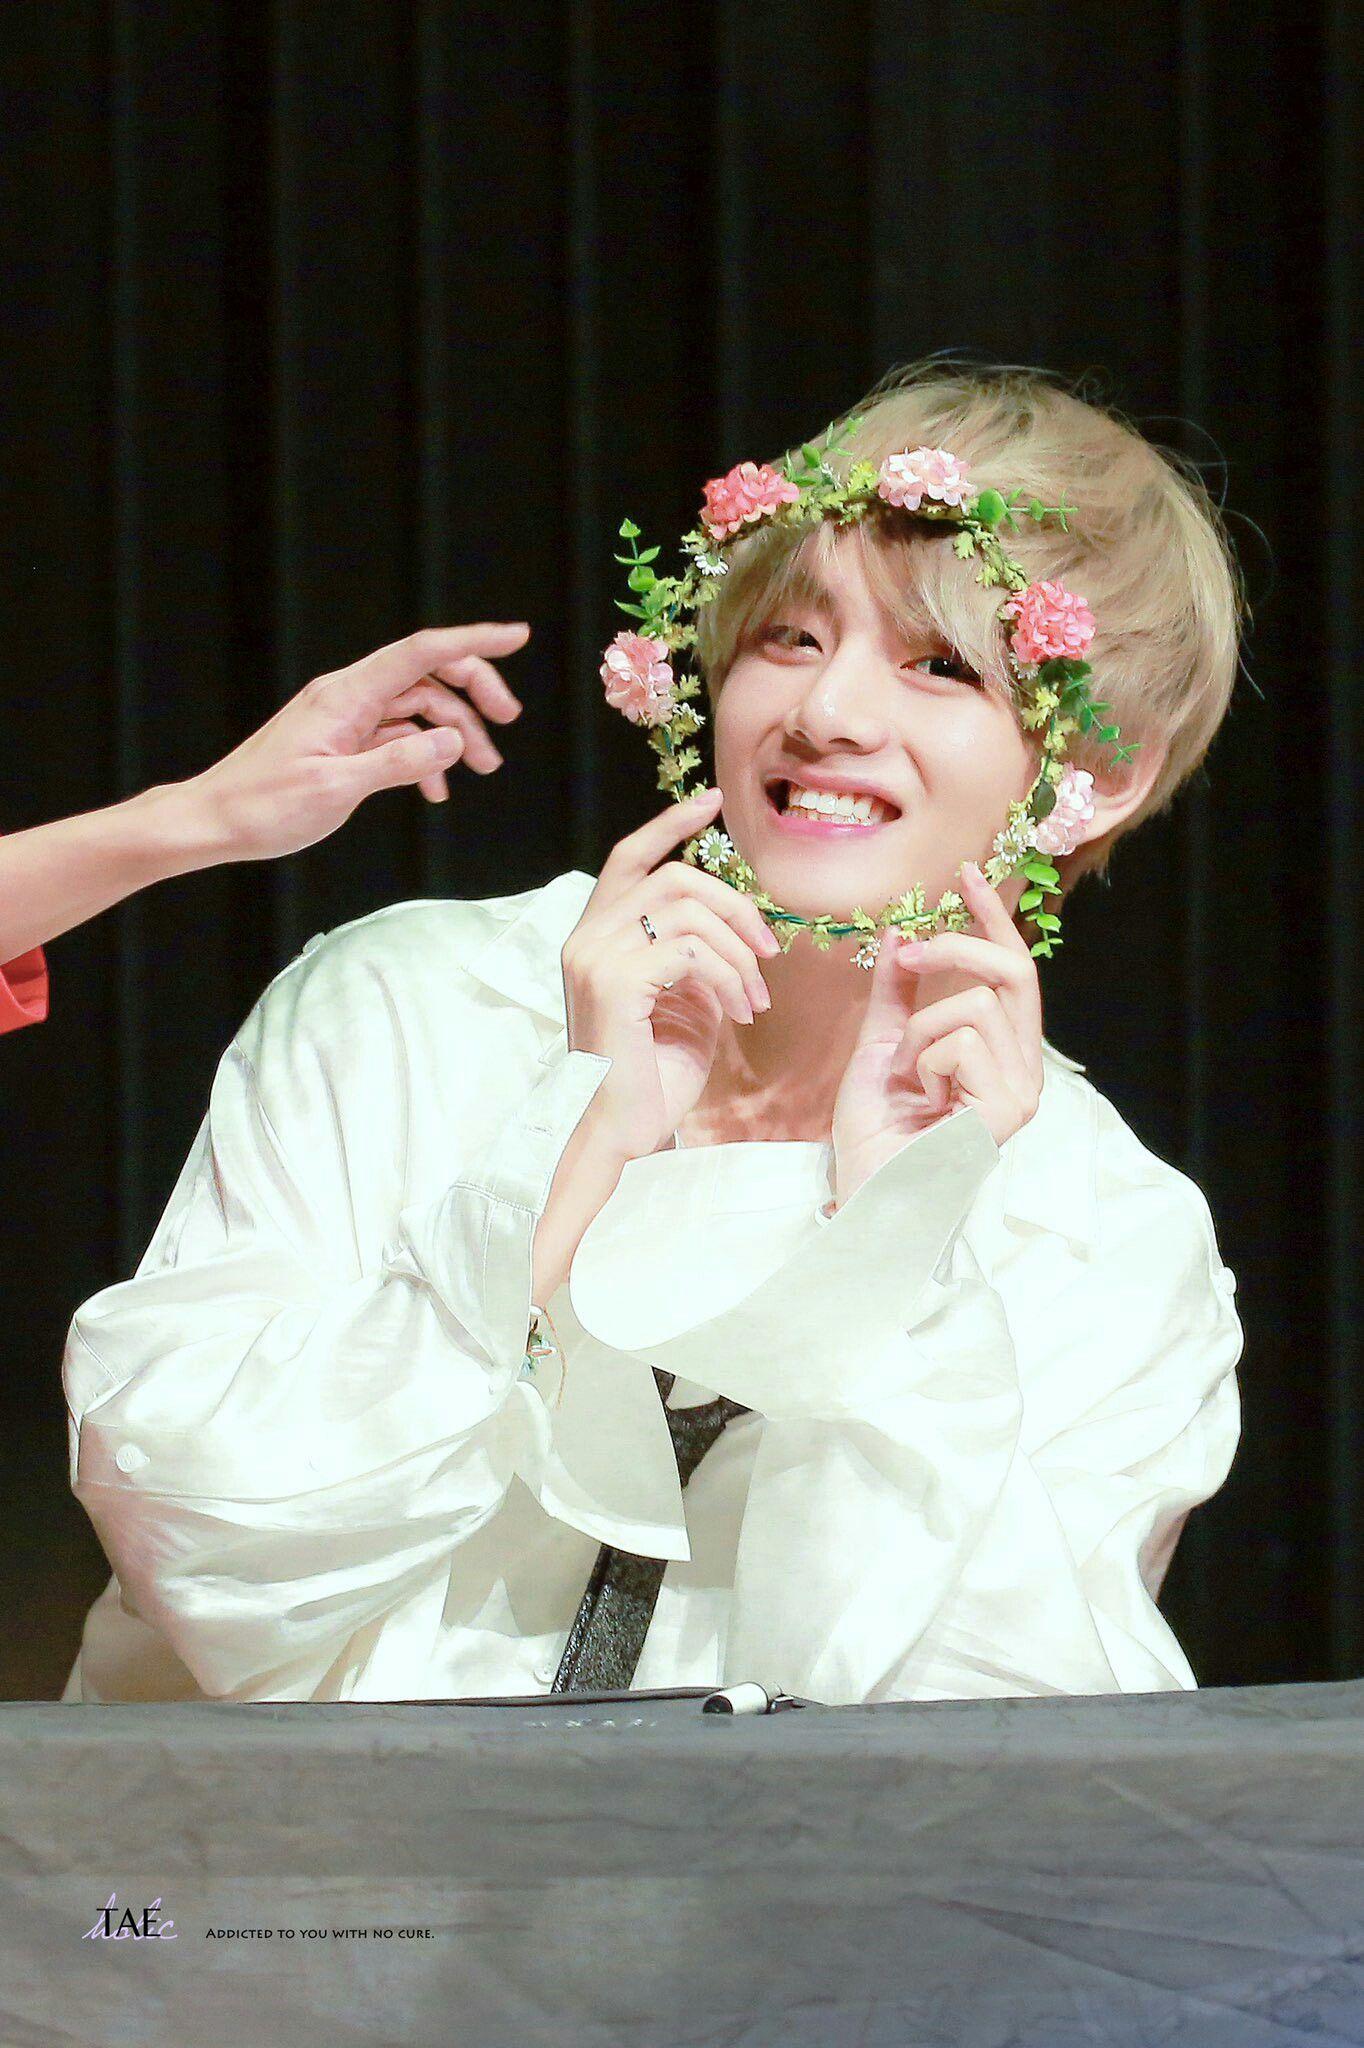 Cute Boy Crying Wallpaper Flower Crown Taetae Bts Taehyung Kim Taehyung Bts